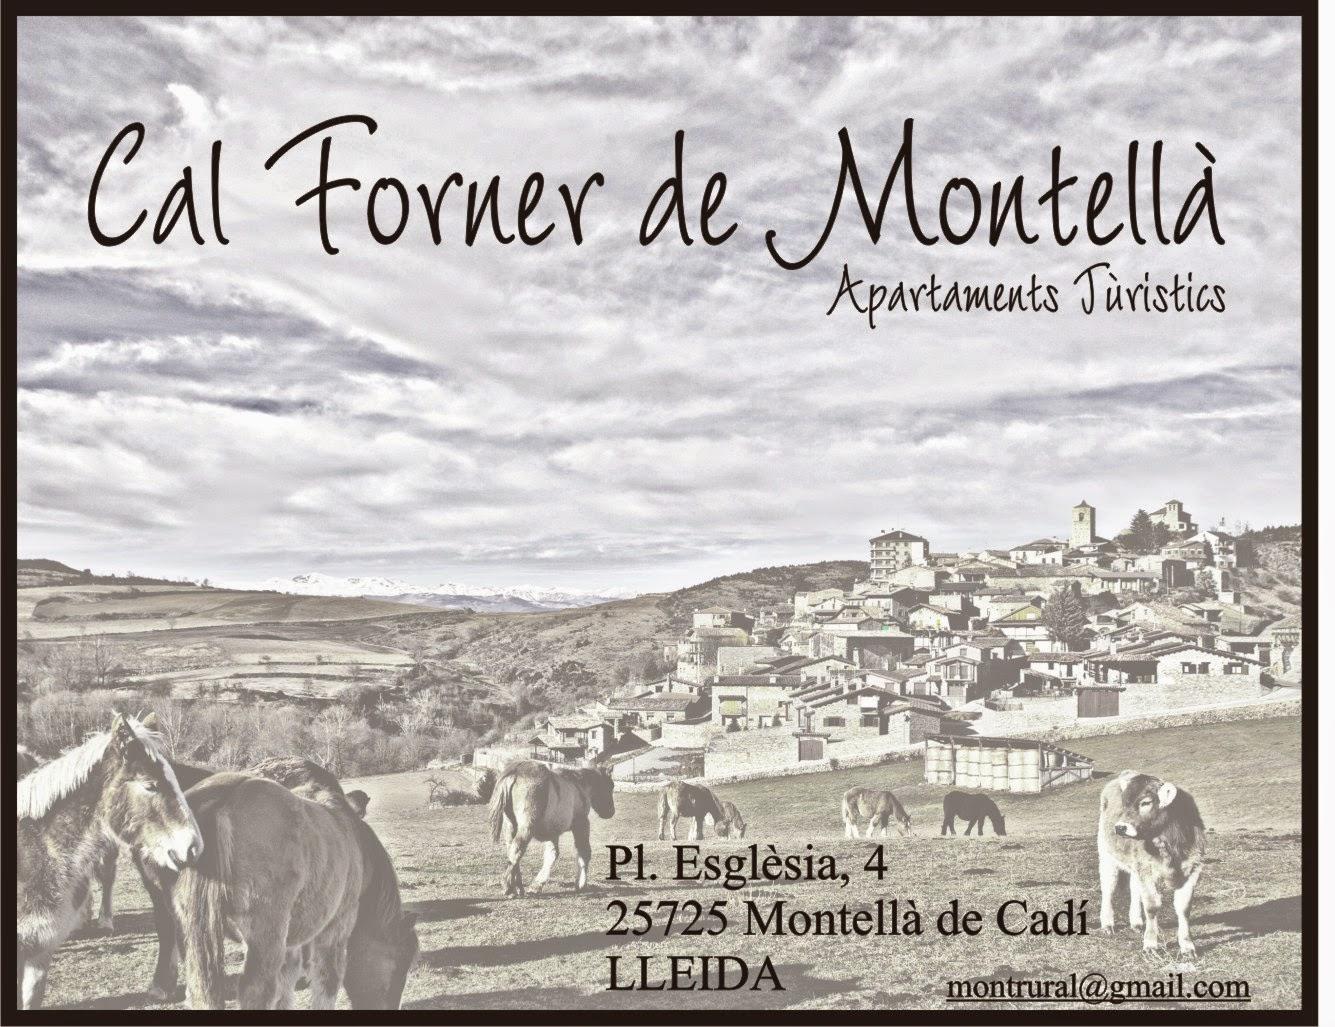 CAL FORNER DE MONTELLÀ